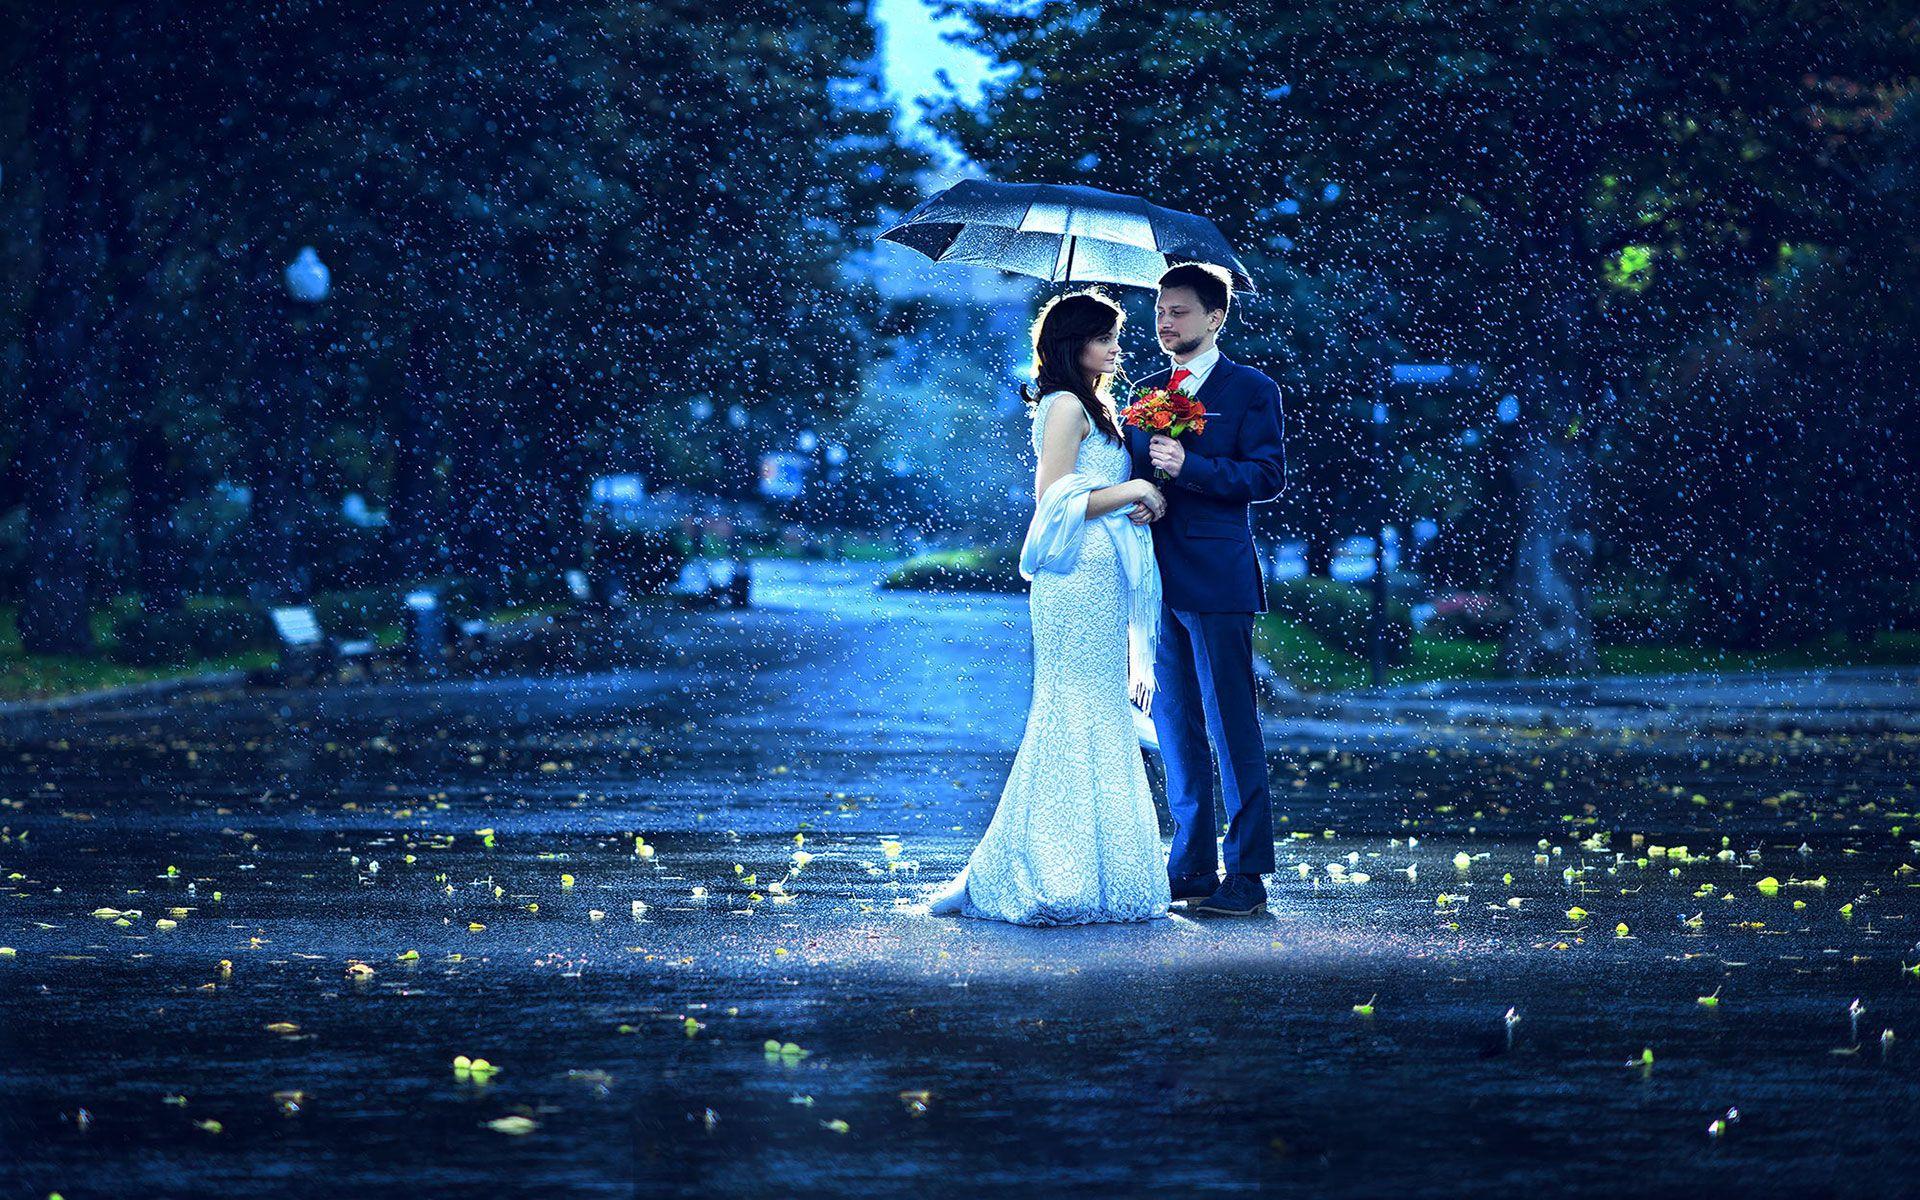 Pin By 010 2476 6756 On Genel Rainy Wedding Rain Photography Couple In Rain